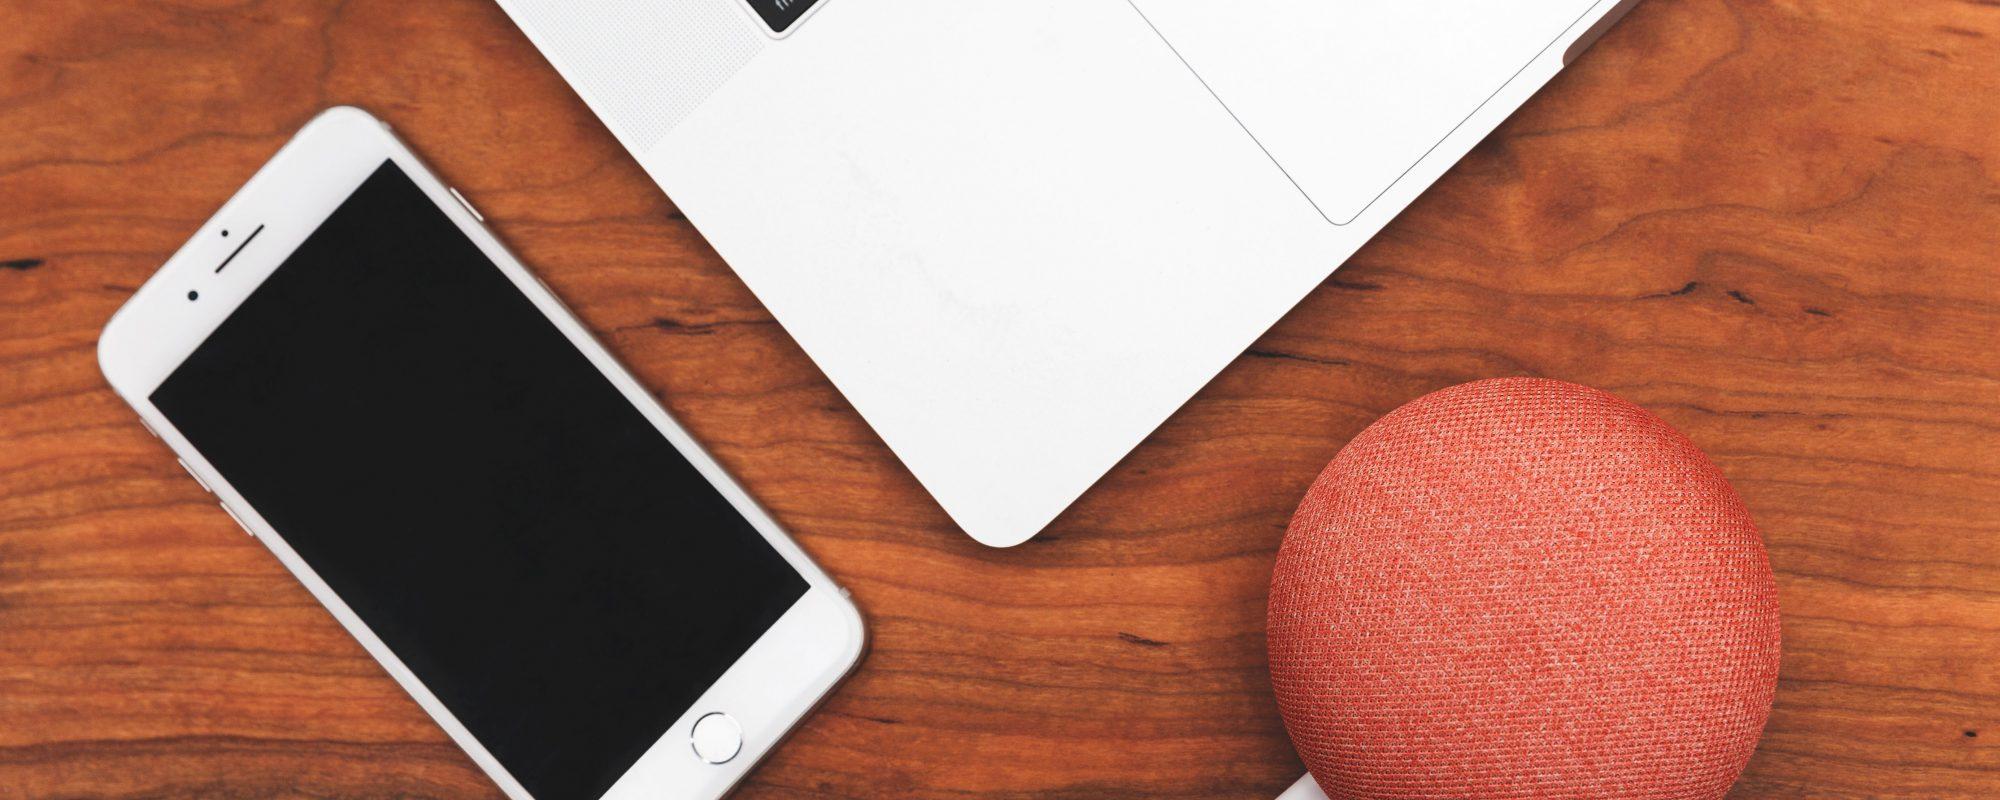 smart-home-assistant-smartphone-laptop_4460x4460